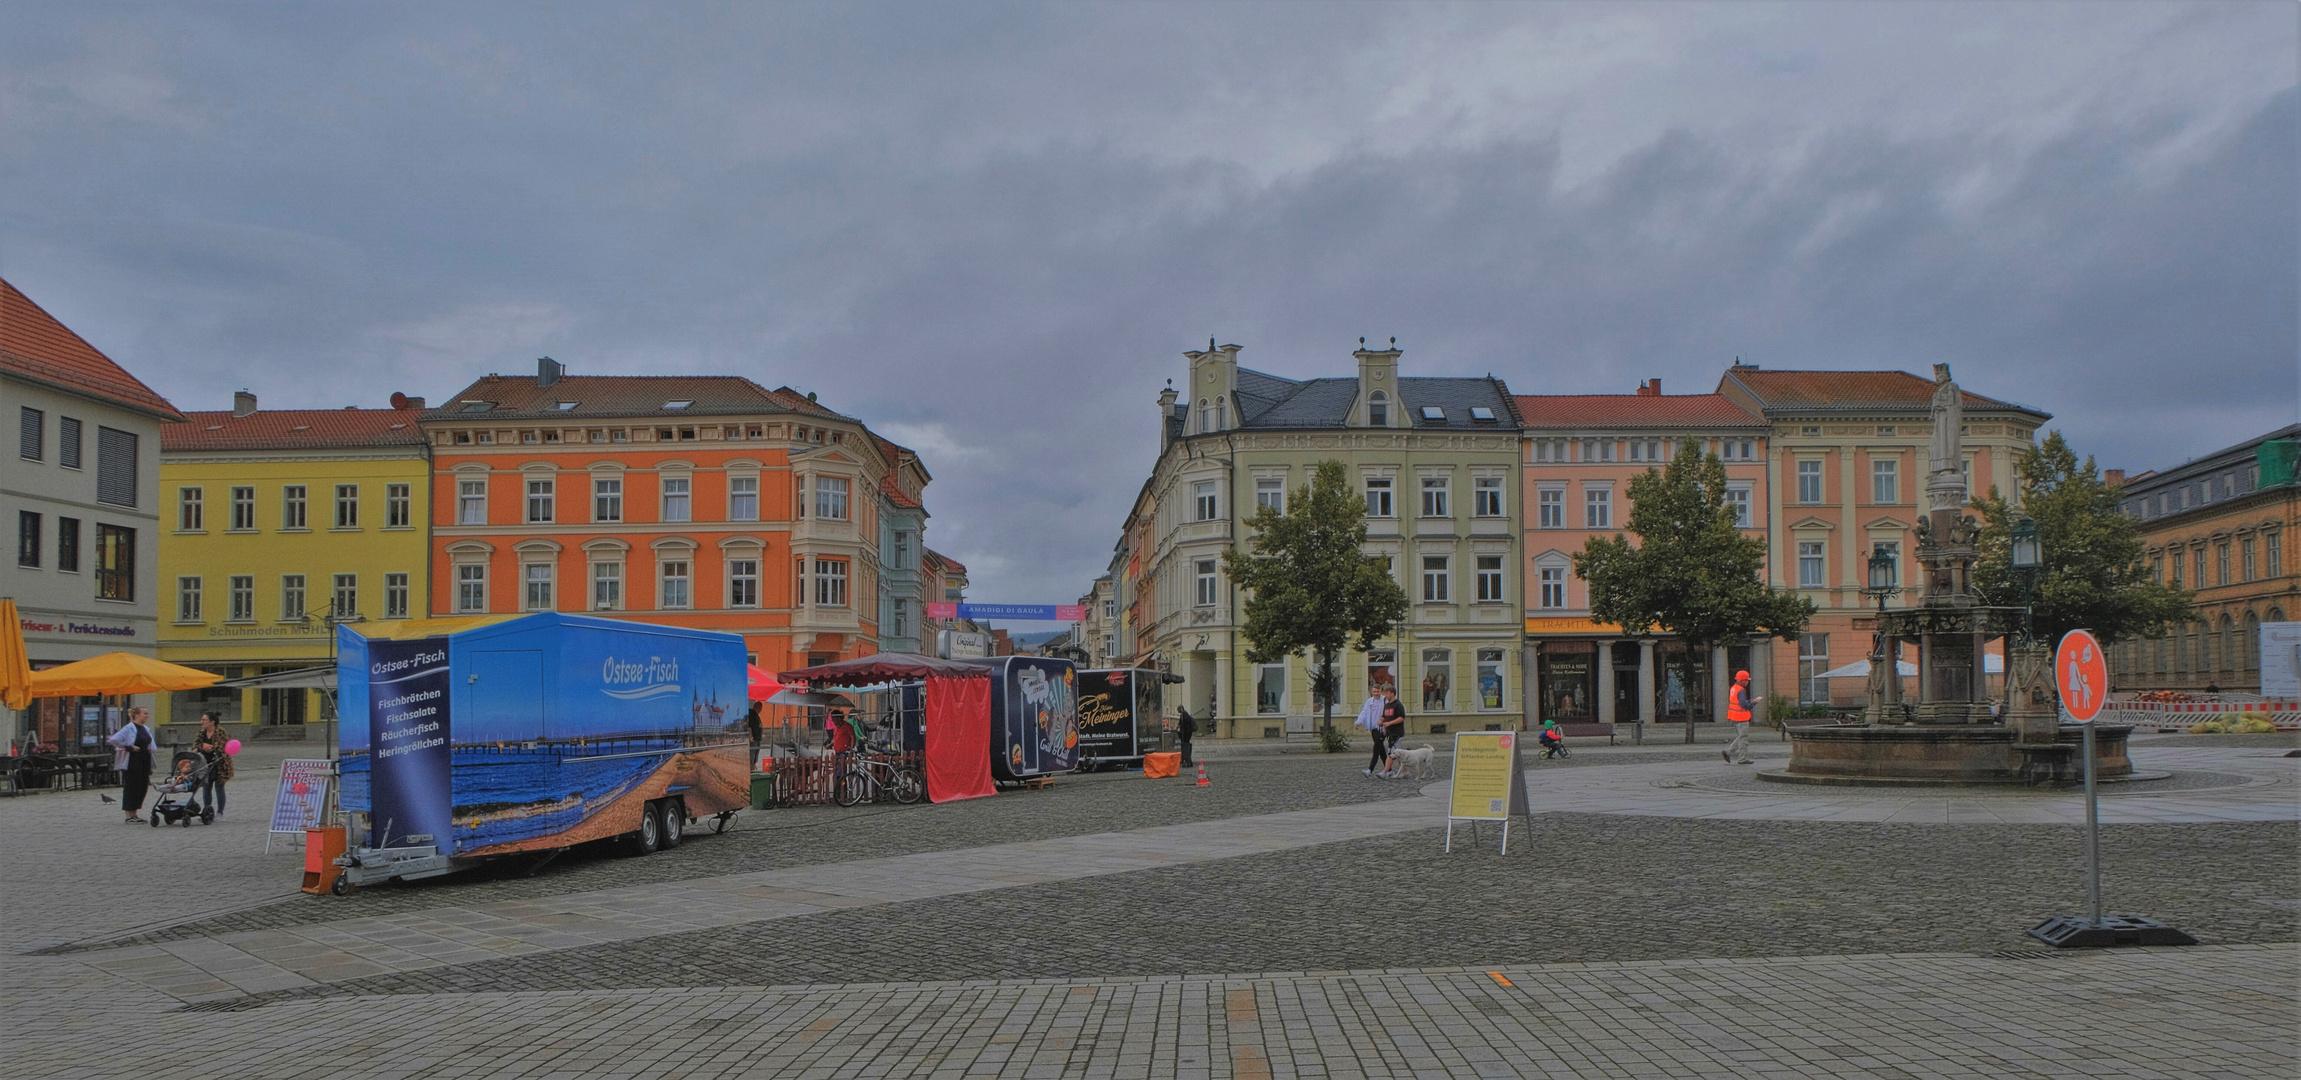 heute mal wieder in Meiningen, 2 (hoy en Meiningen otra vez)